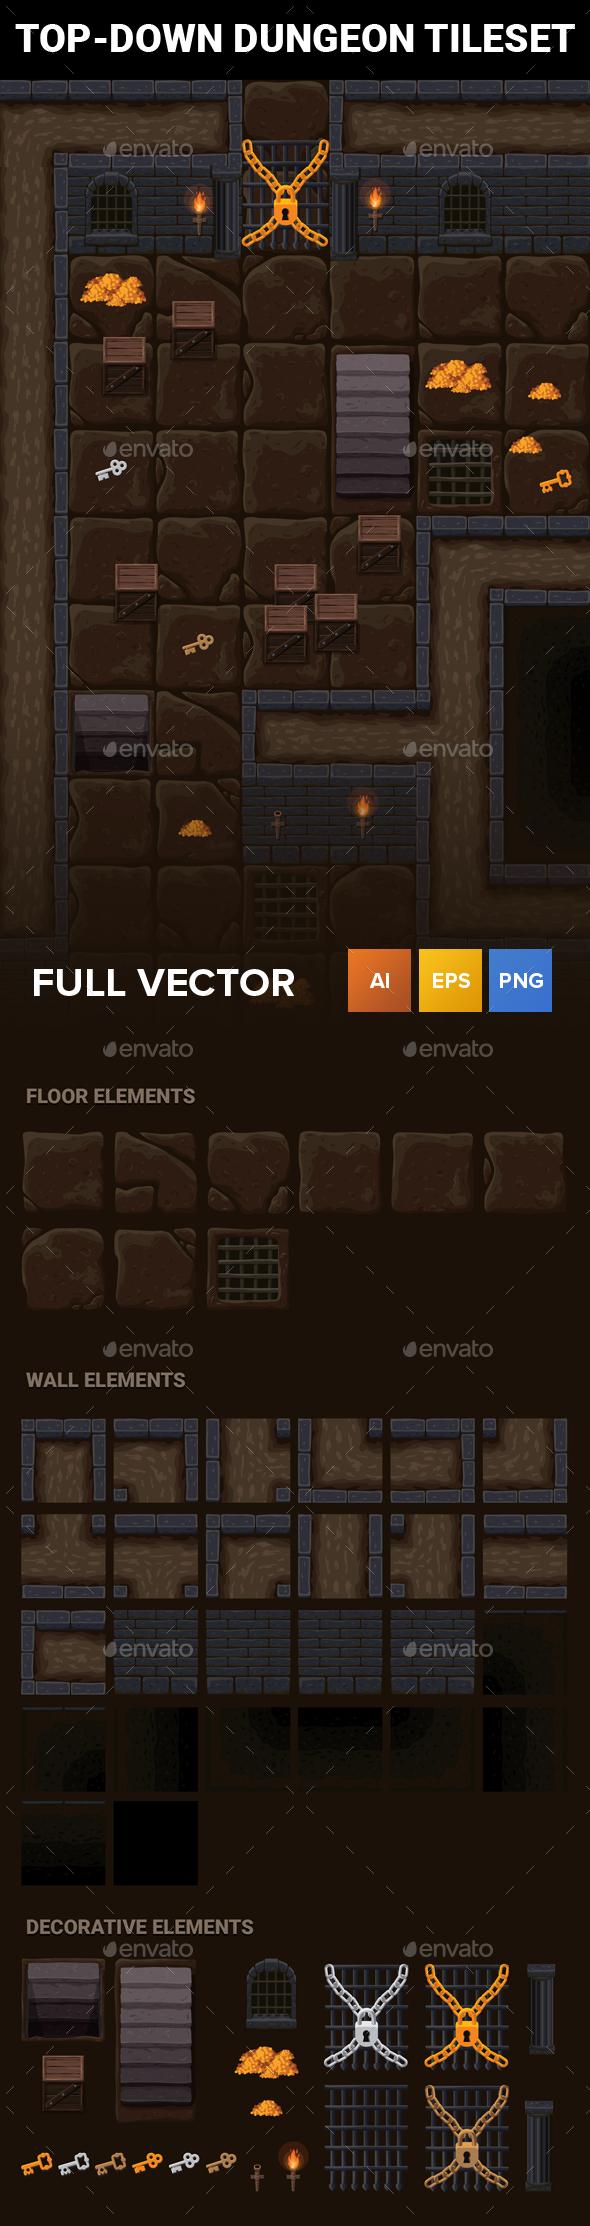 TopDown Dungeon RPG Tileset — Vector EPS grille 2d